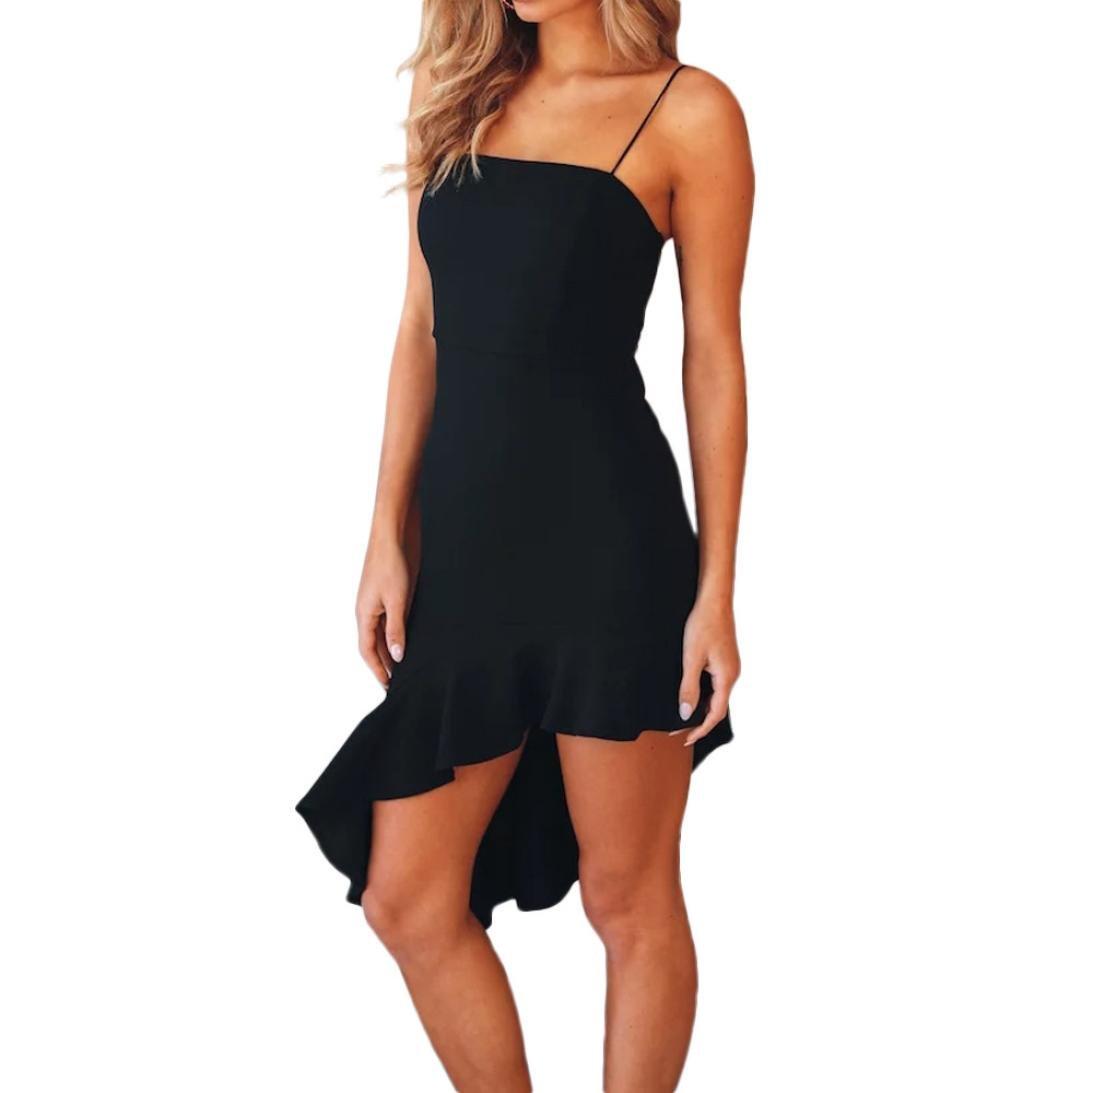 Minisoya Women Off Shouder Bodycon Club Mini Dress Casual Irregular Backless Evening Party Sling Dress Beach Sundress (Black, XL) by Minisoya